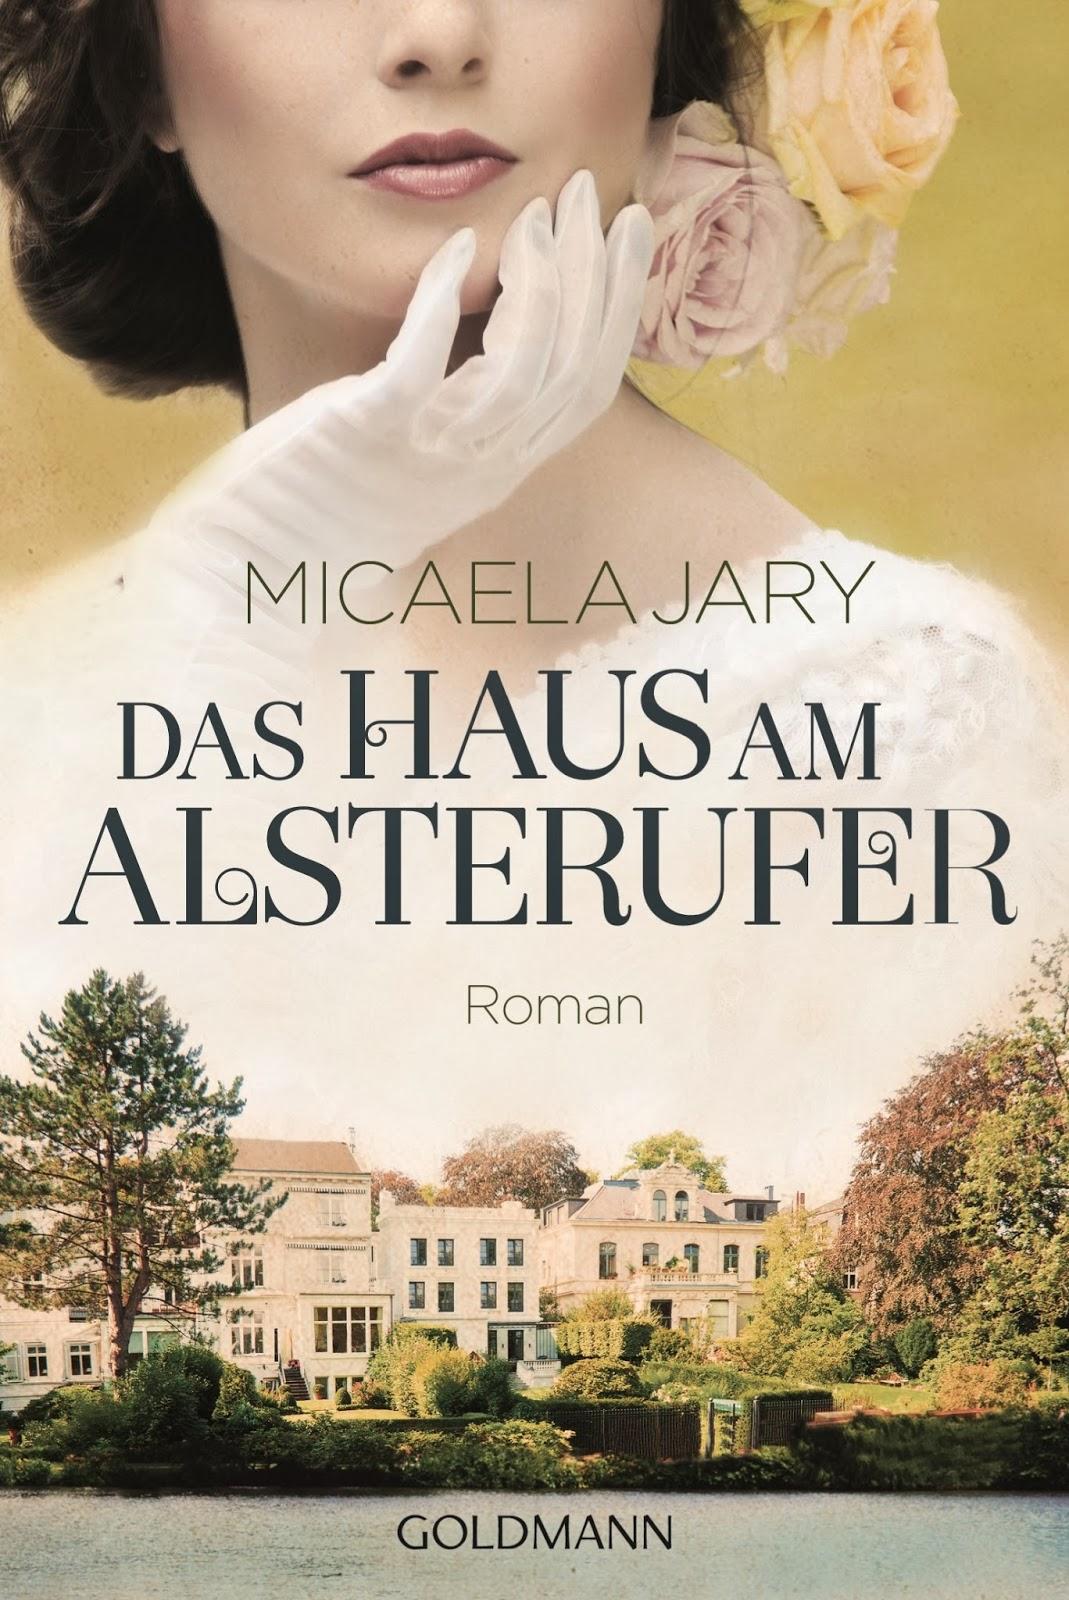 http://www.randomhouse.de/Taschenbuch/Das-Haus-am-Alsterufer-Roman/Micaela-Jary/e437655.rhd